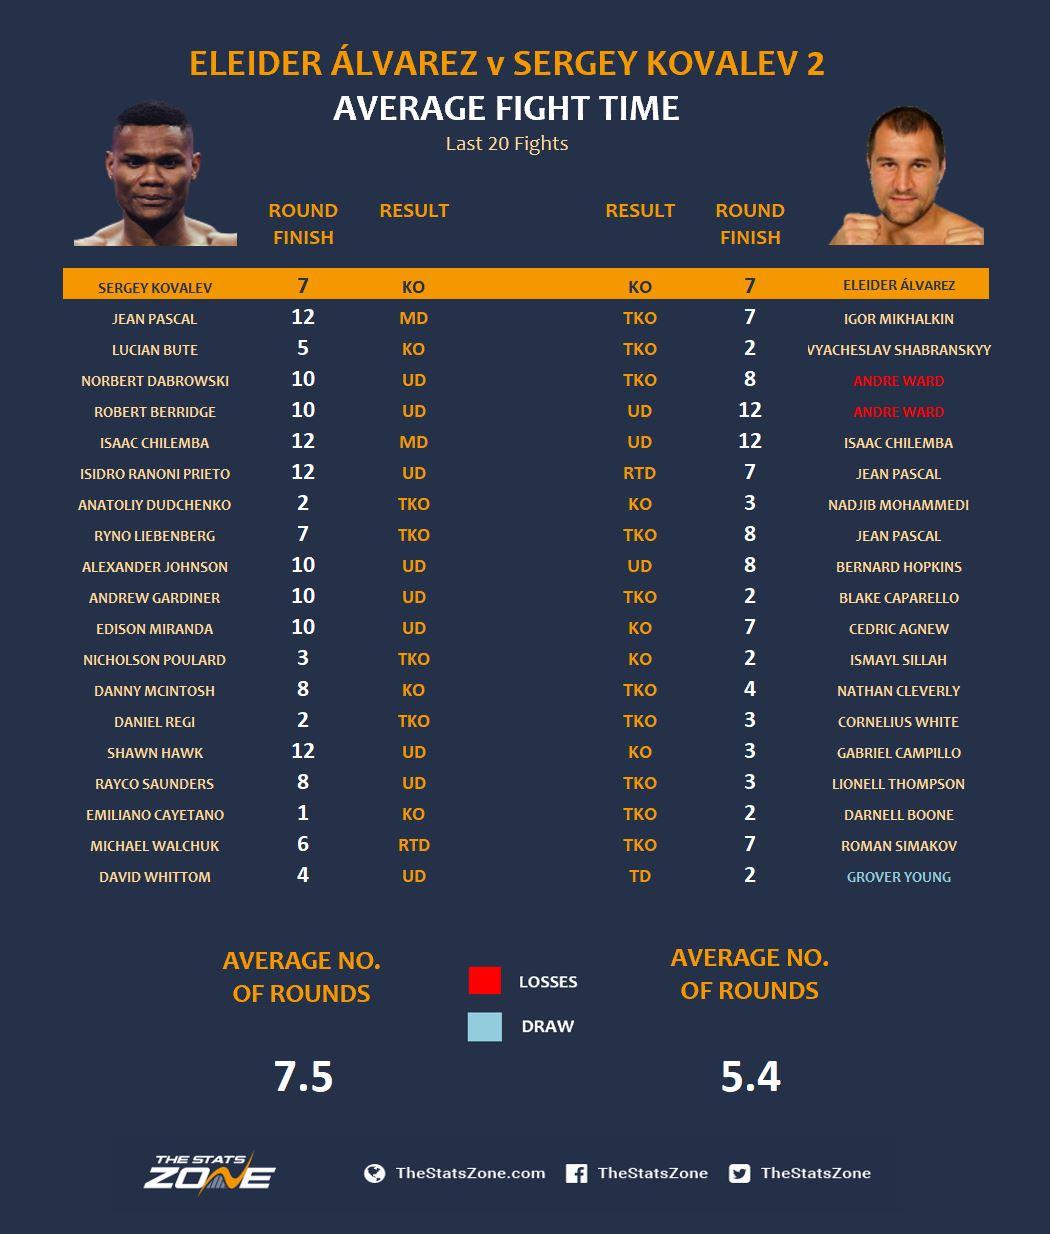 EA v SK Average Rounds.JPG